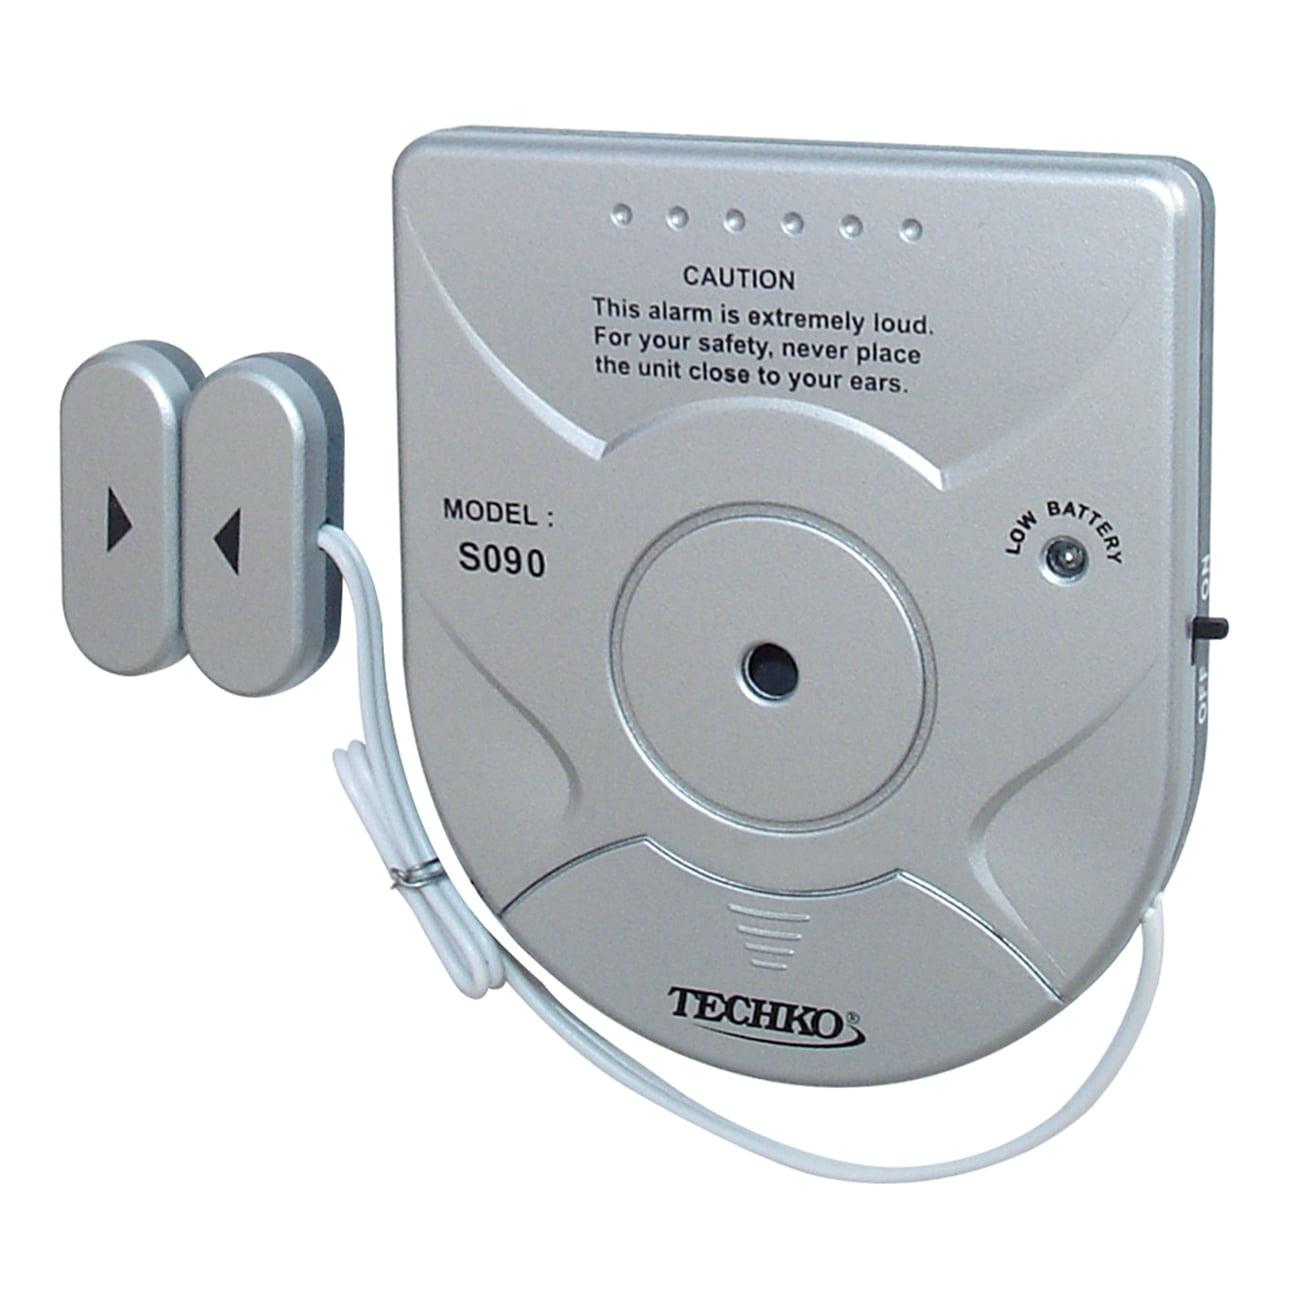 Techko S090 Solar Powered Magnetic Sensor Entry Alarm